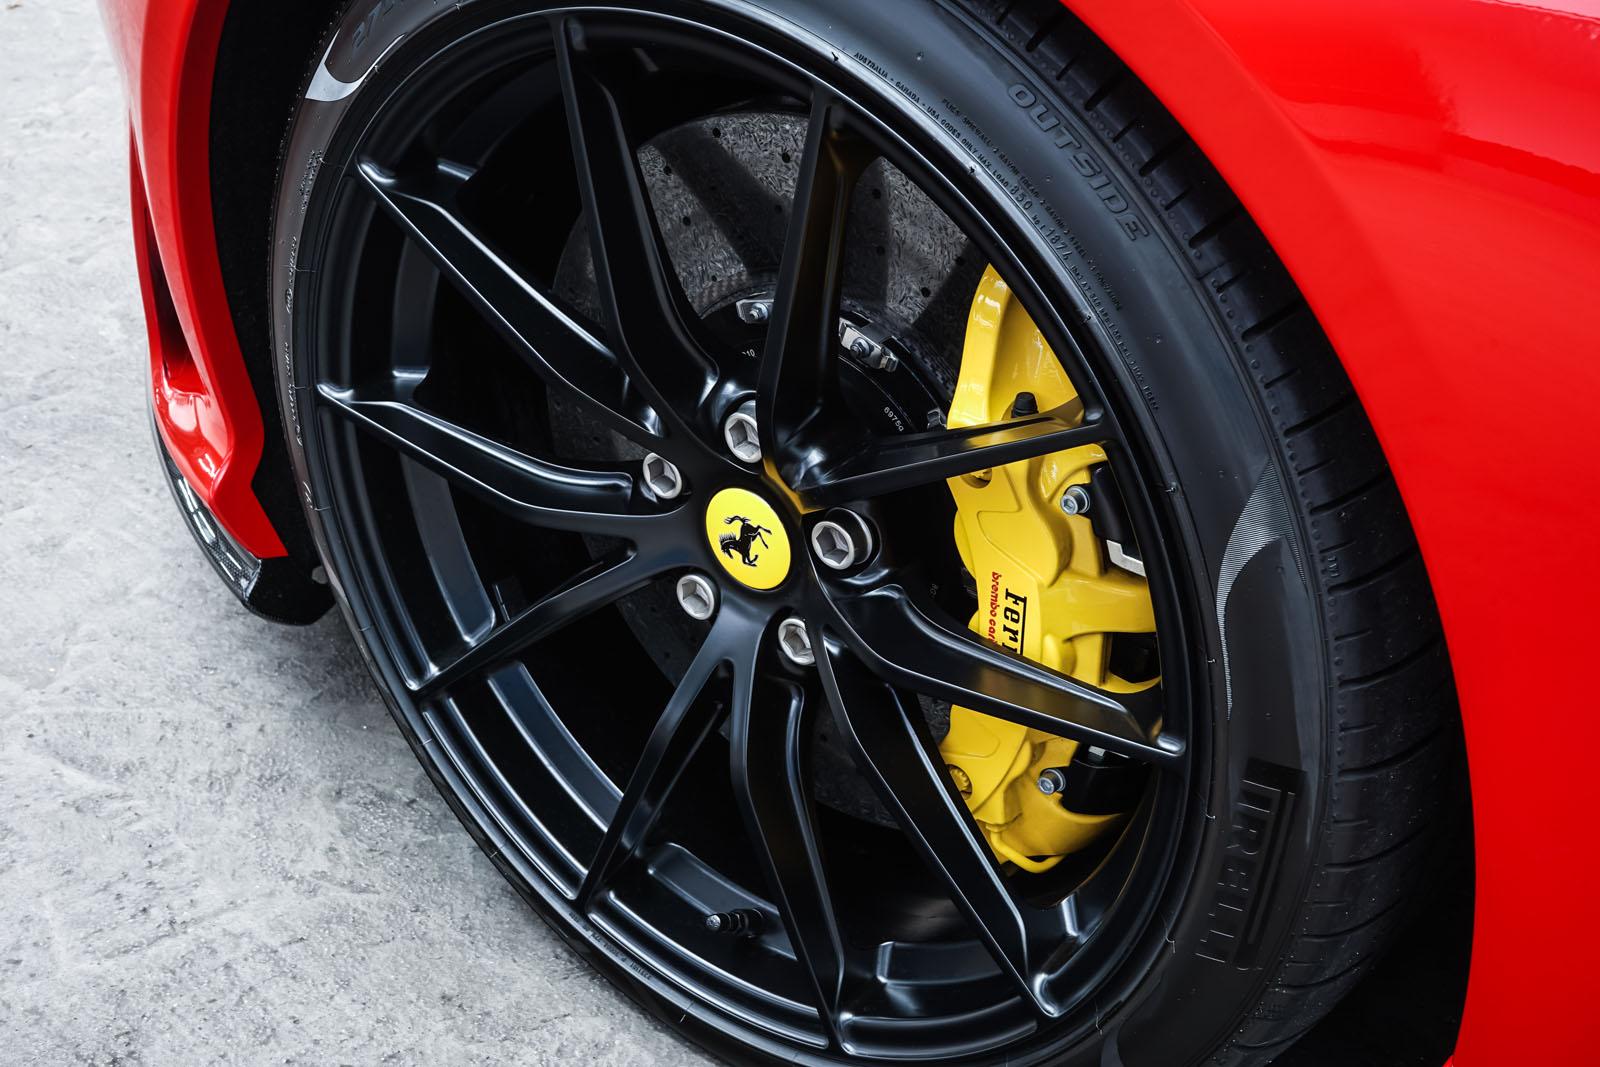 Ferrari_812_Superfast_Rot_Schwarz_FER-9922_12_w